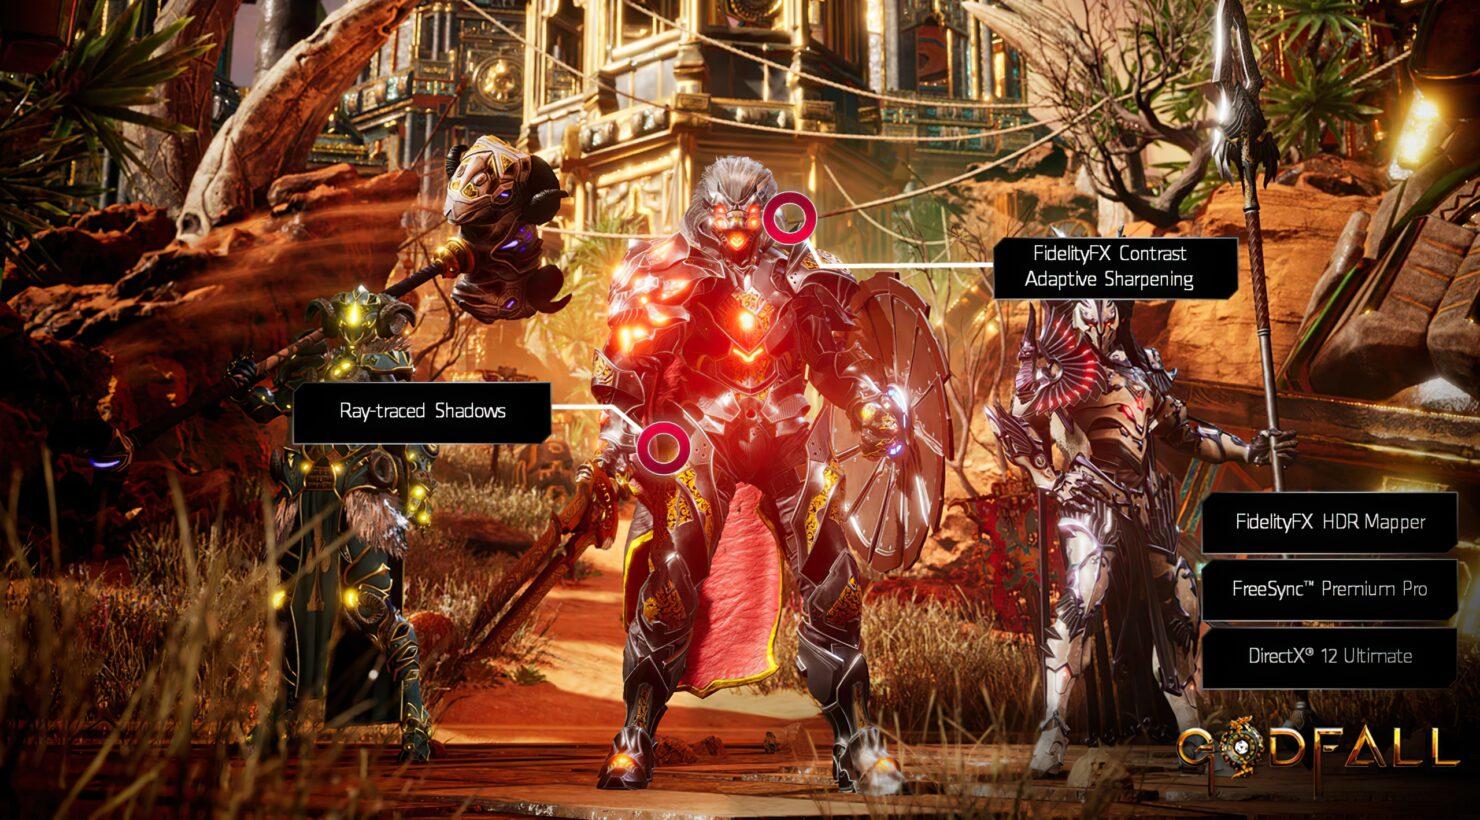 AMD Godfall Features